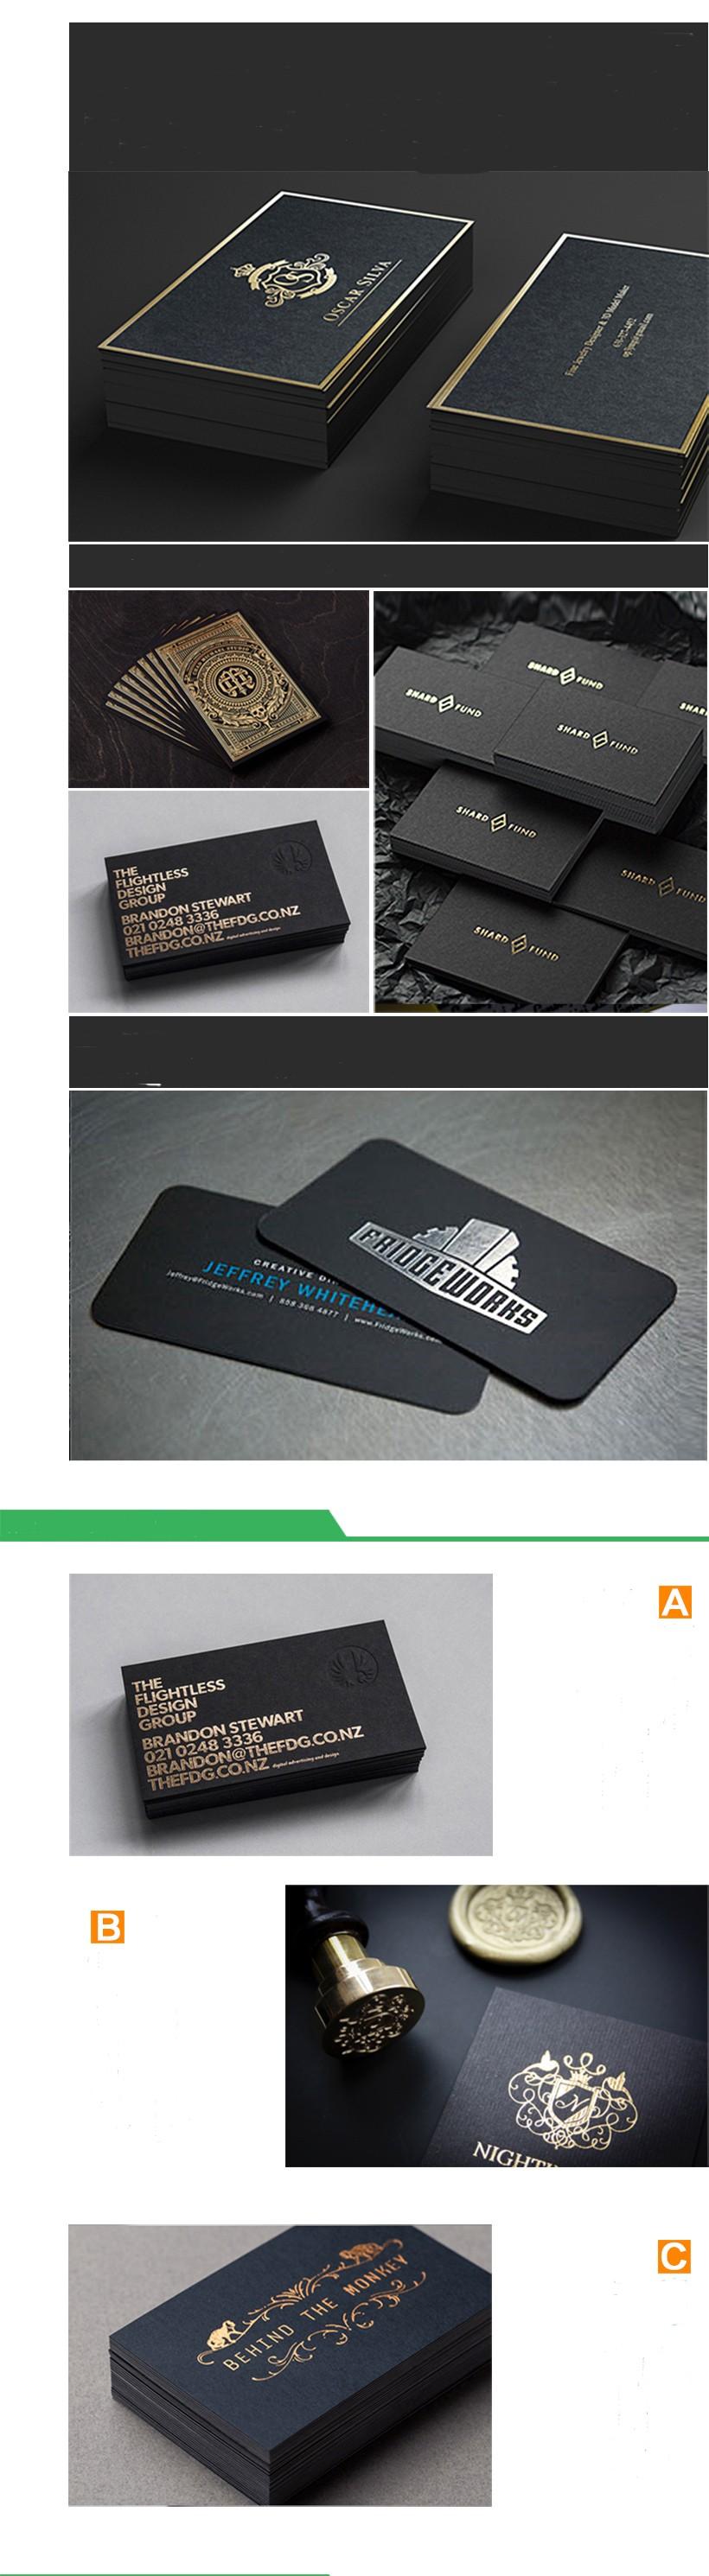 Foiled Embossed Carbon Fiber Business Cards Printing Buy